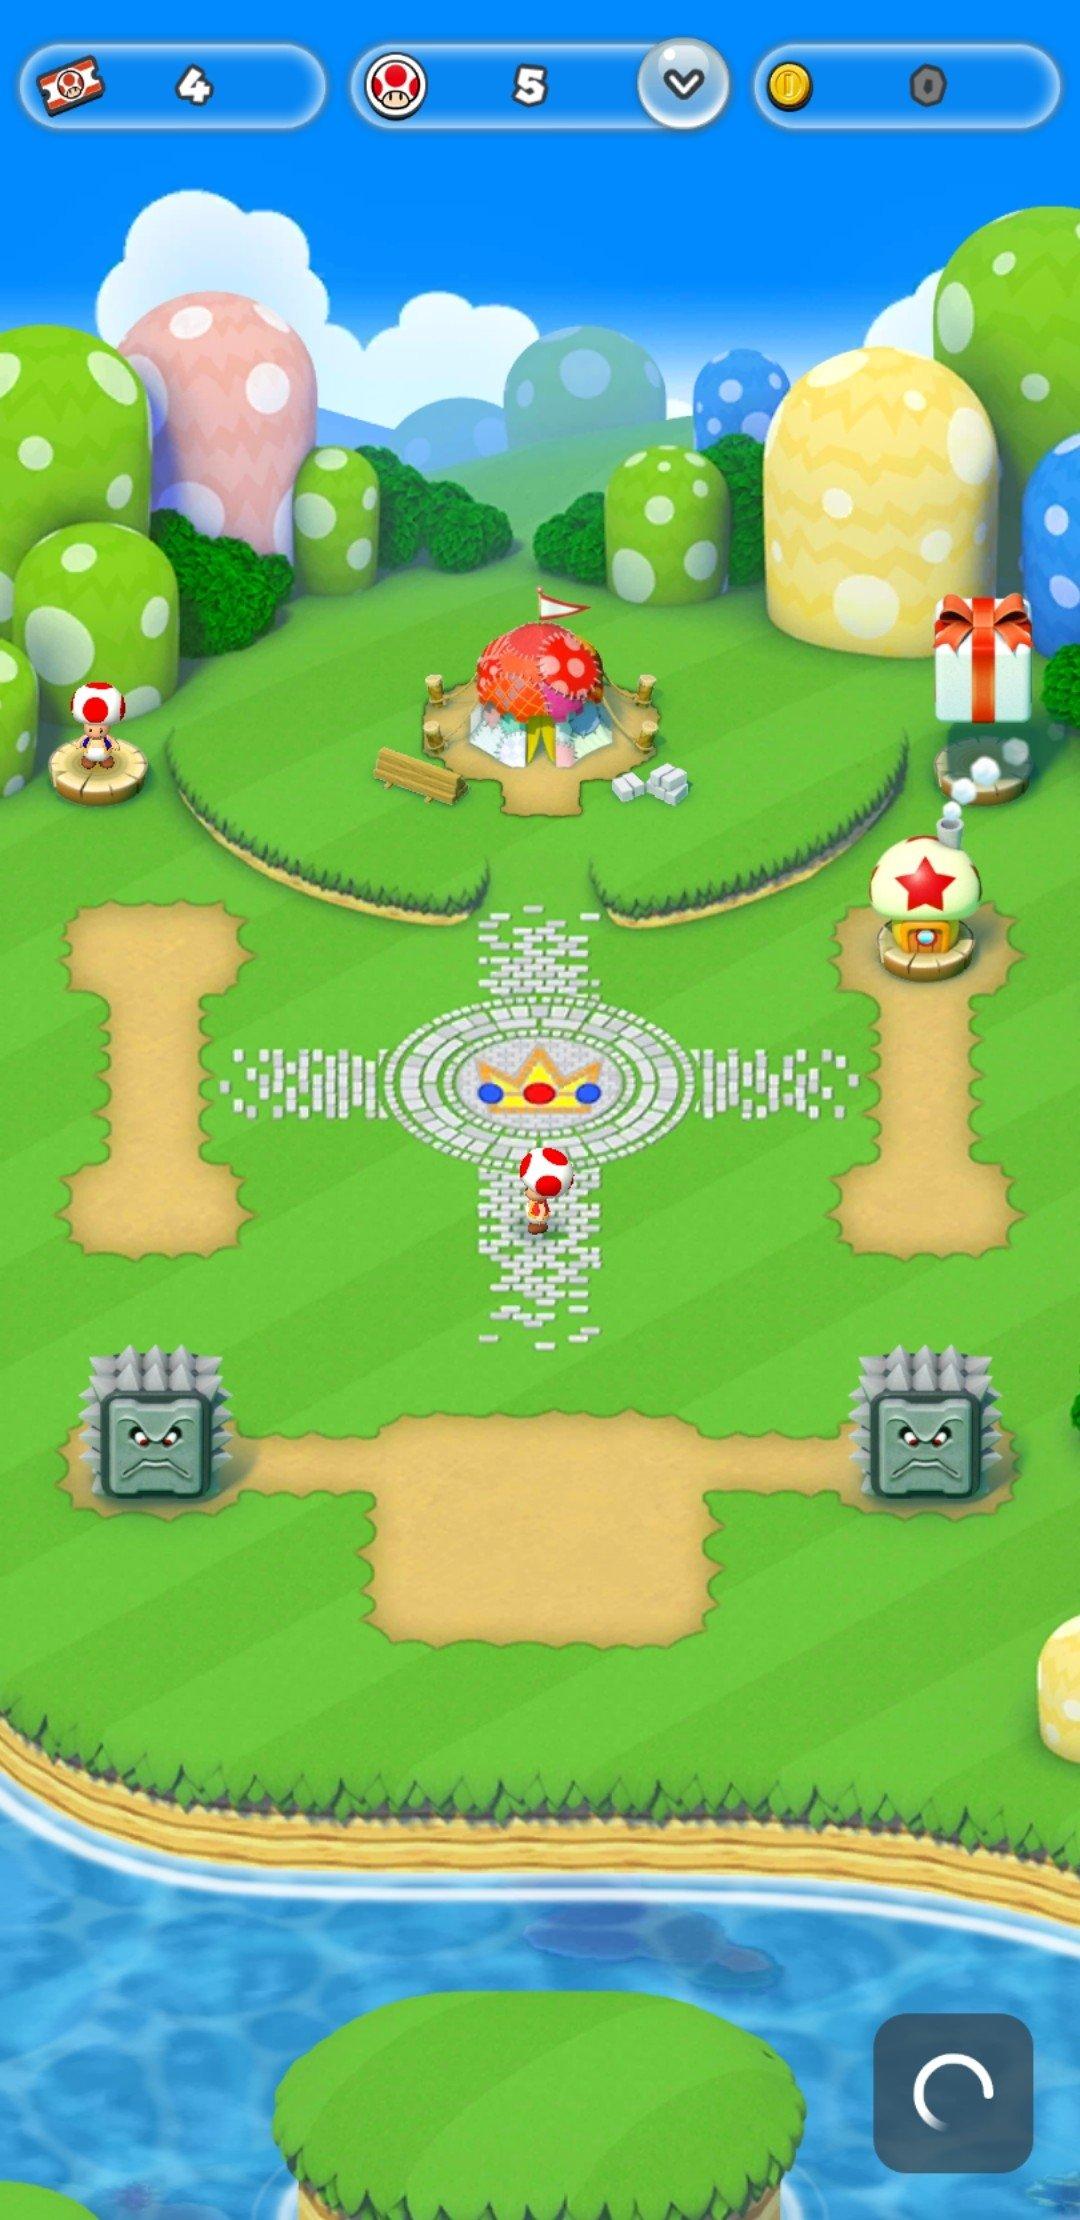 Descargar Super Mario Run 3 0 10 Android Apk Gratis En